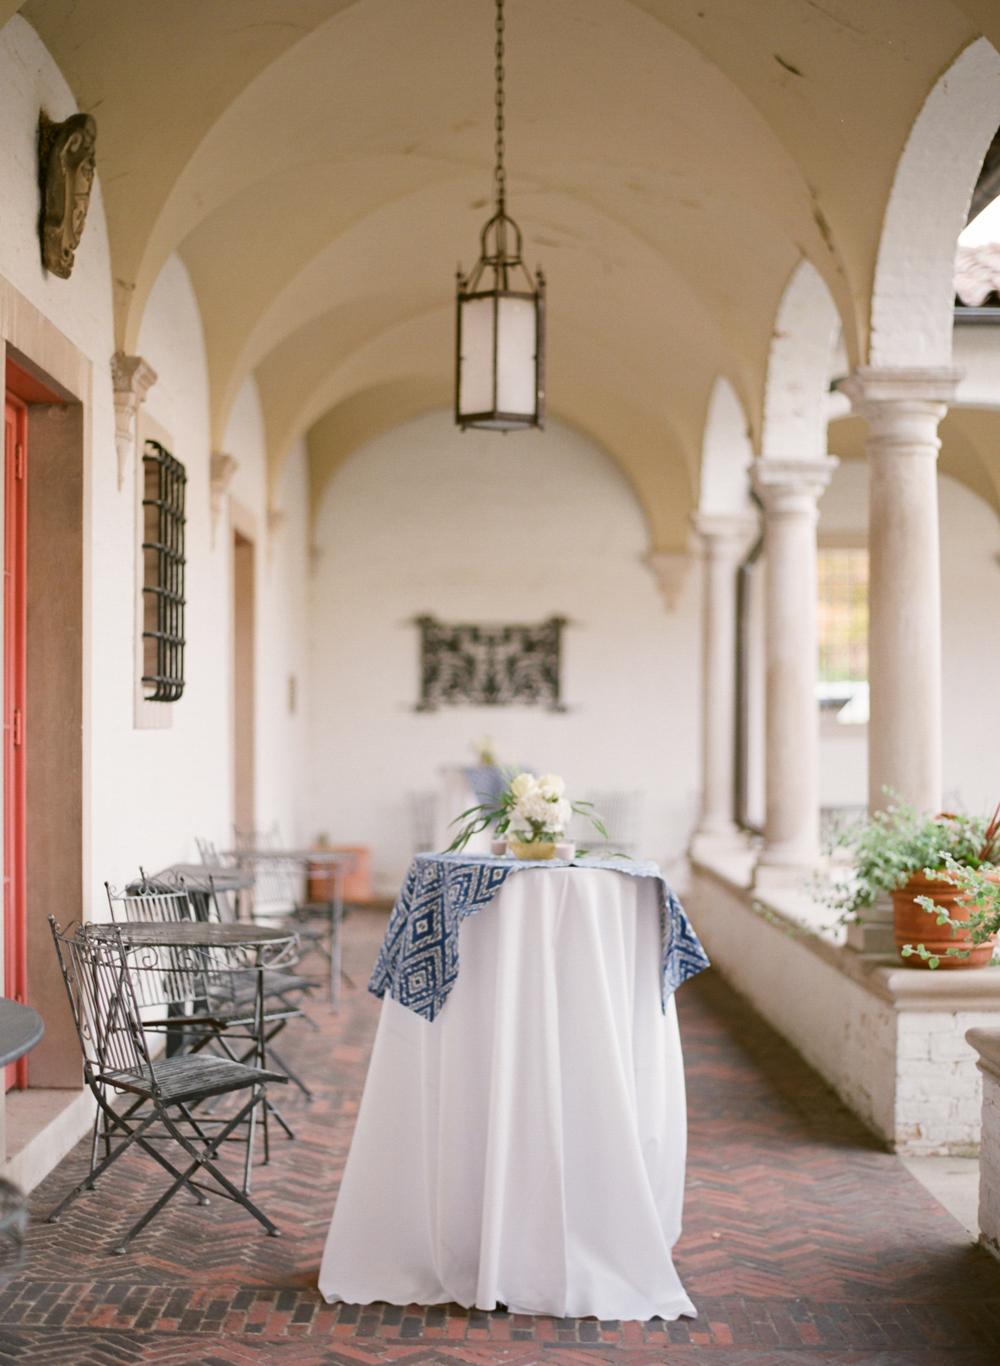 Villa_Terrace_Museum_Wedding_Photographer_028.jpg